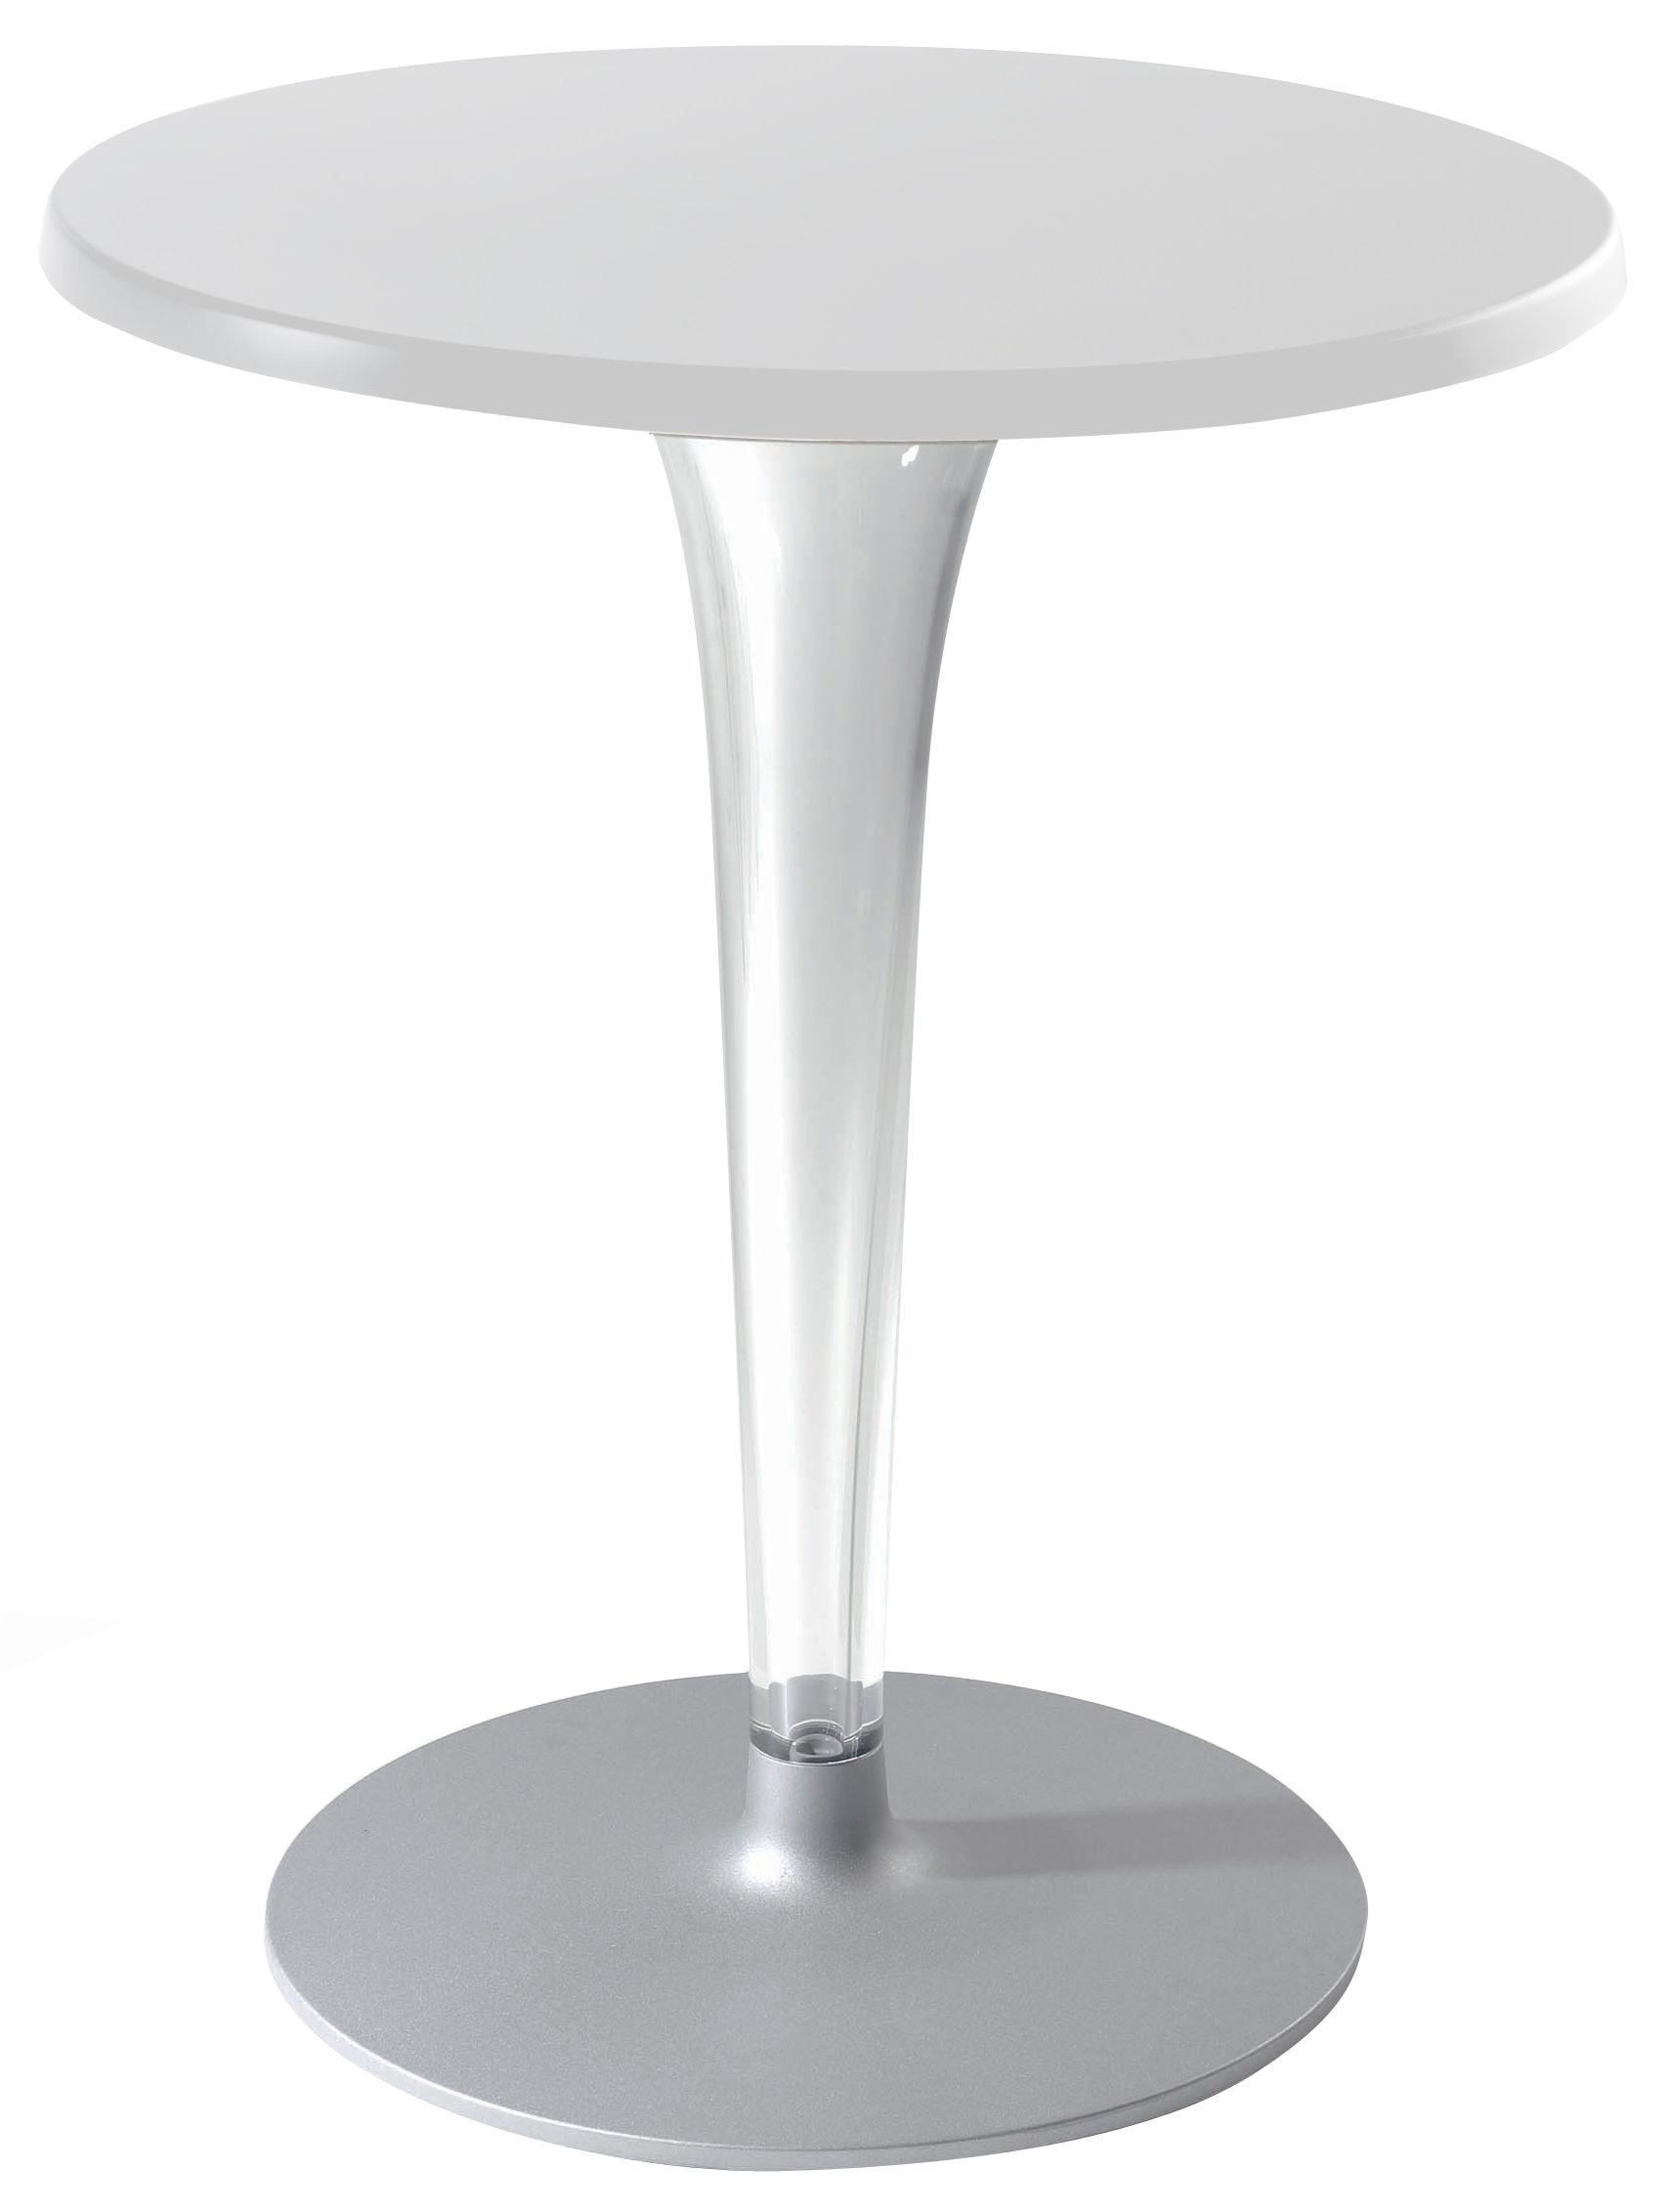 Outdoor - Tables de jardin - Table ronde Top Top - Contract outdoor / Ø 70 cm - Kartell - Blanc/ pied rond - Aluminium verni, Mélamine, PMMA